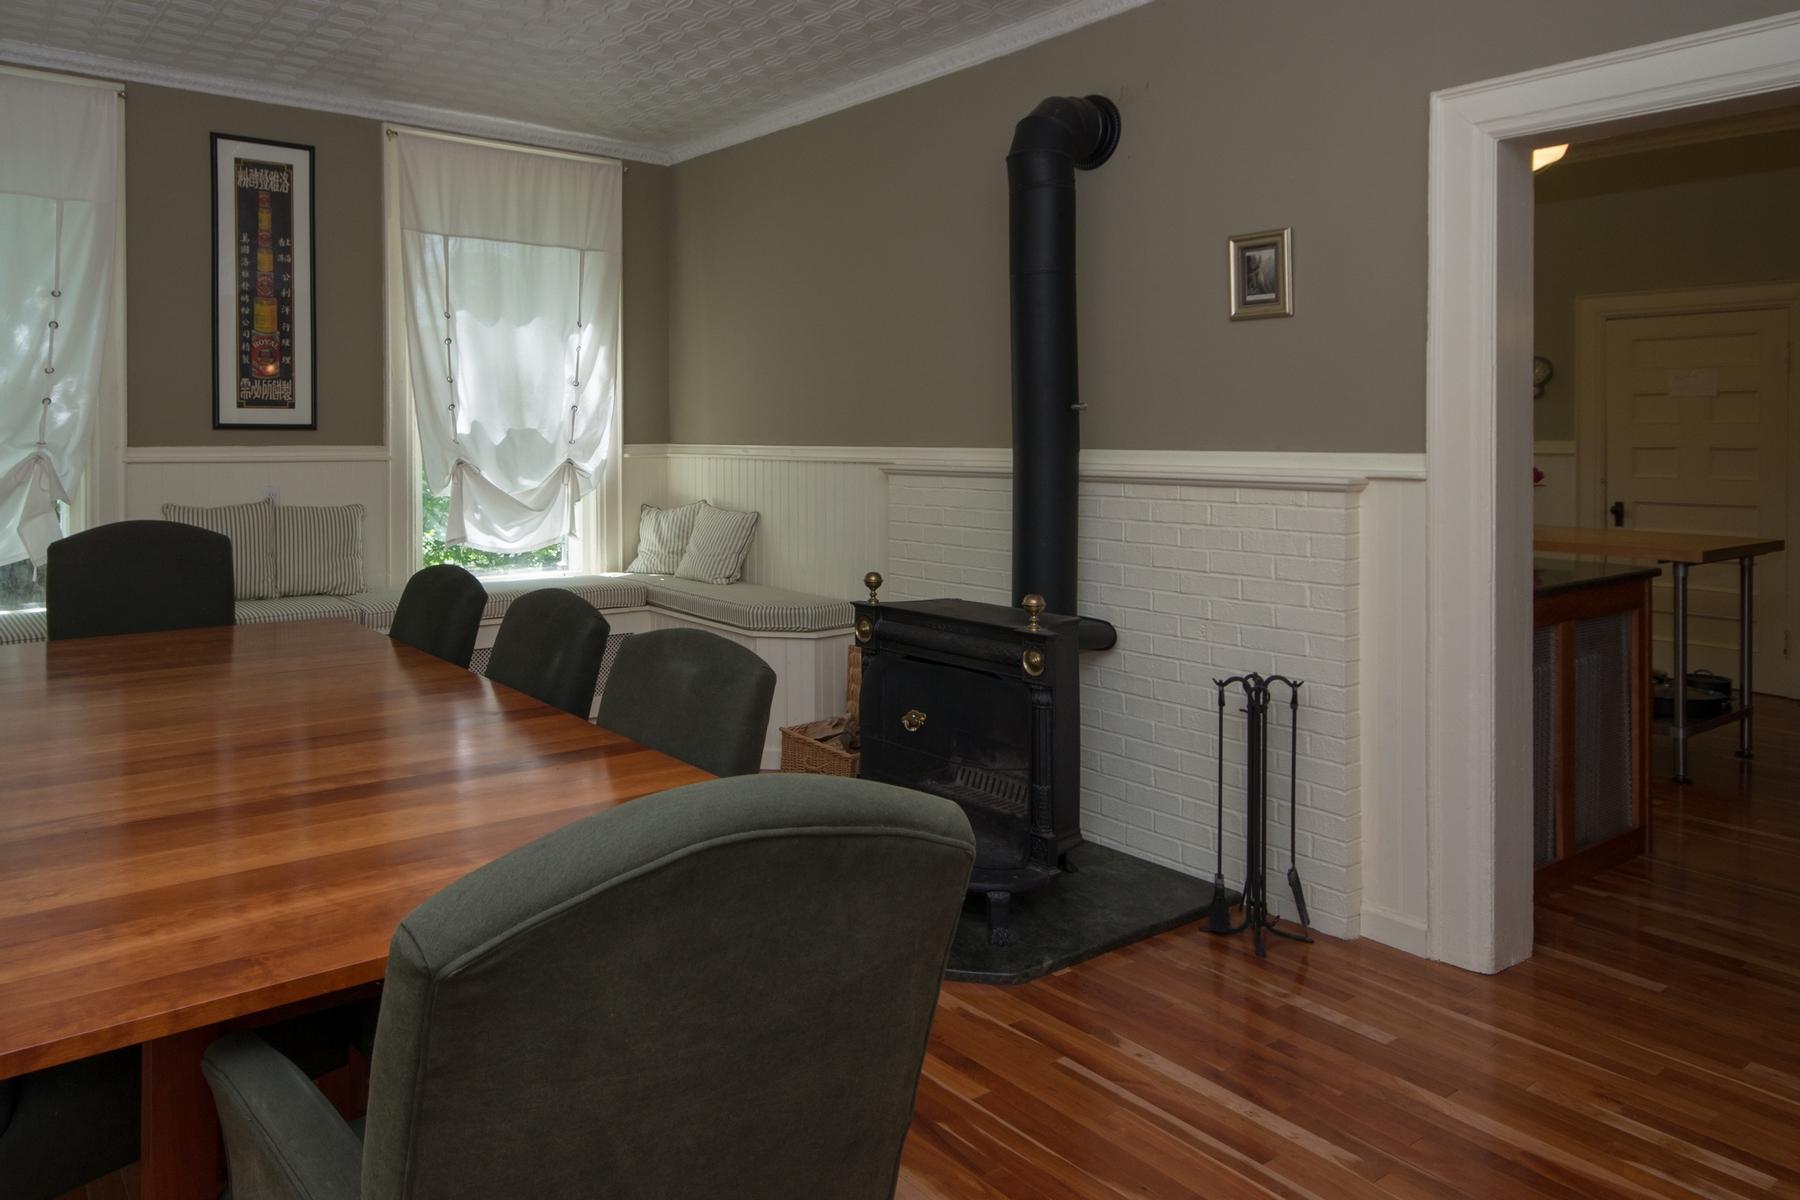 Additional photo for property listing at Franklin Manor 8  Franklin Av 萨拉纳克莱克湖, 纽约州 12983 美国